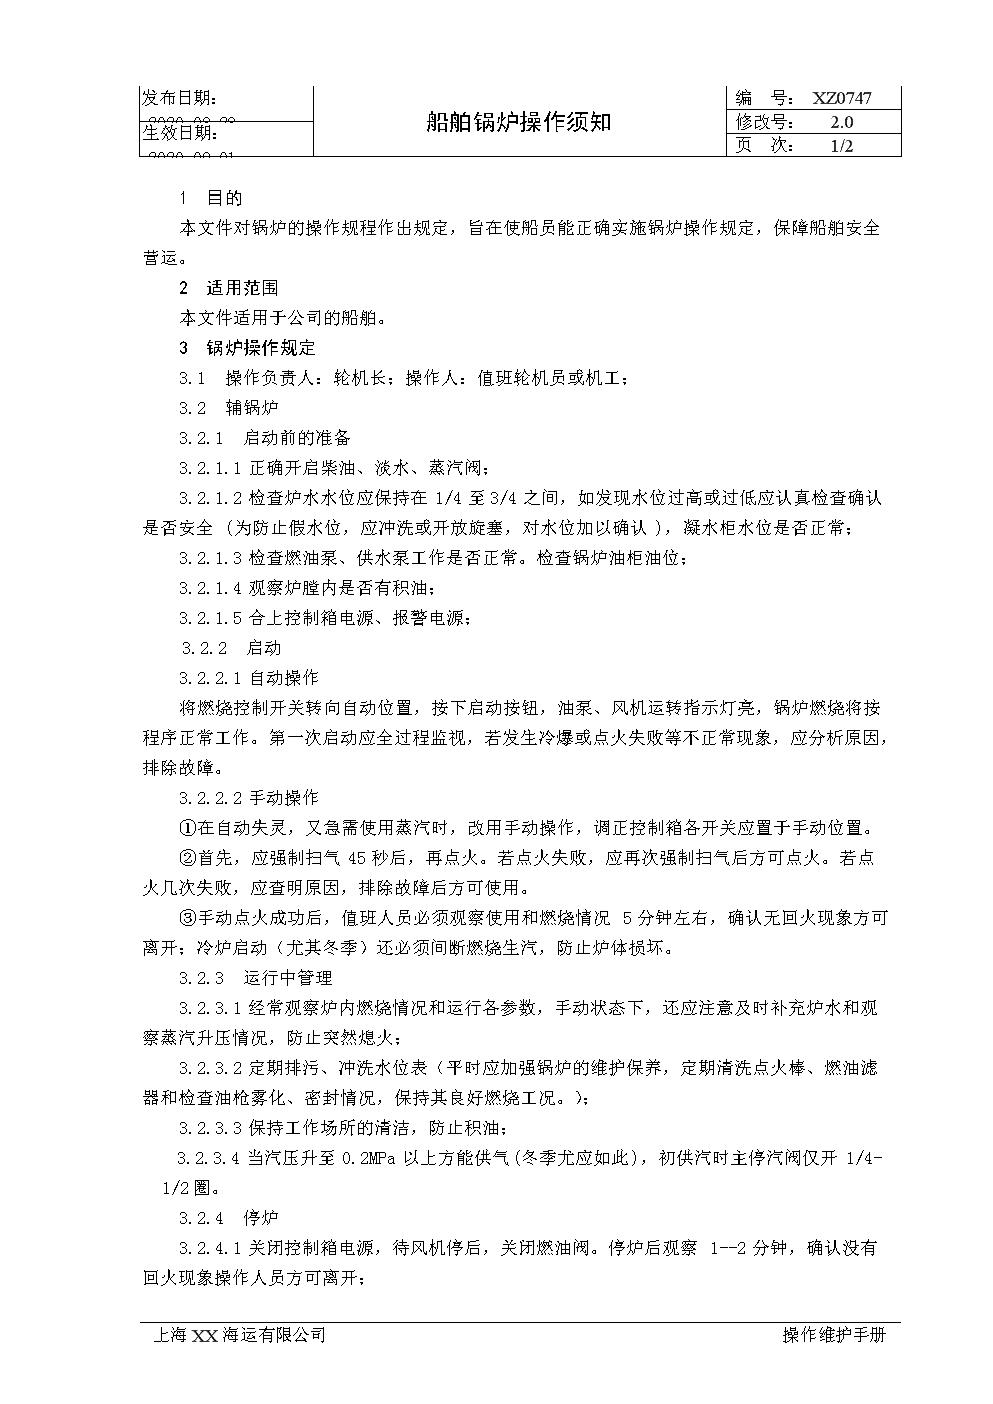 XX海運有限公司XX海運有限公司船舶鍋爐操作須知.doc